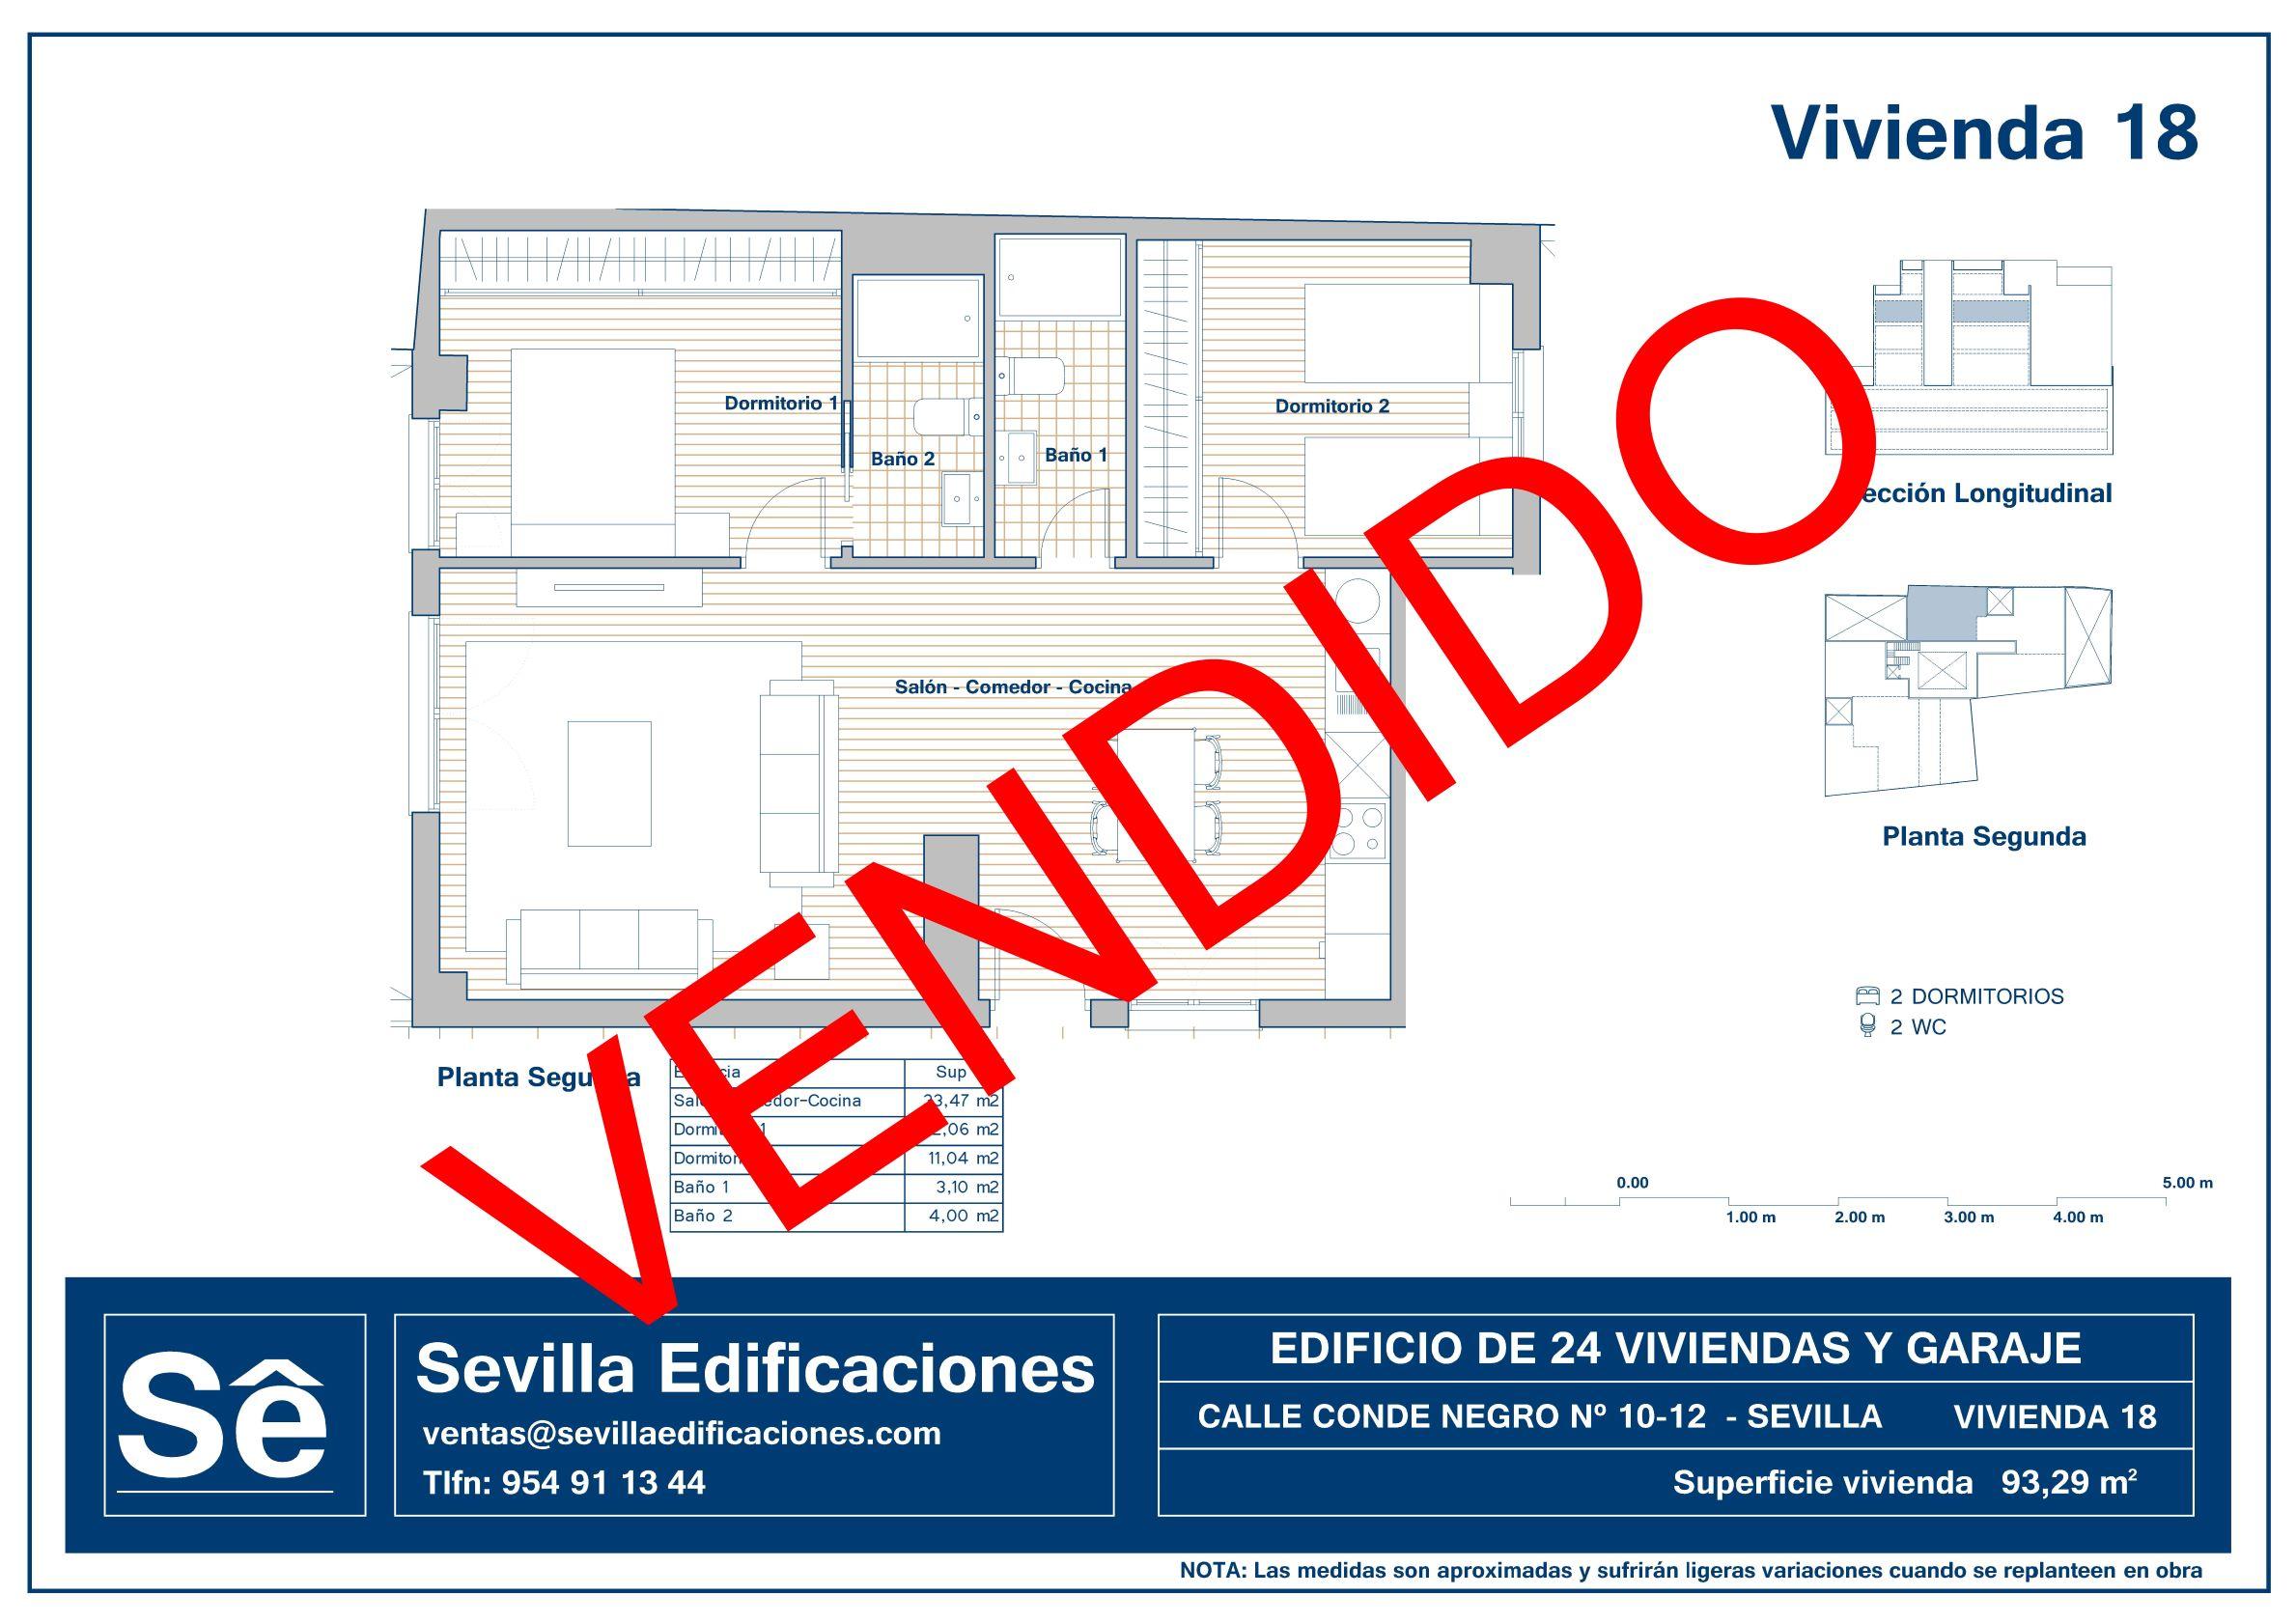 CONDENEGRO_VIVIENDA_18_VENDIDO